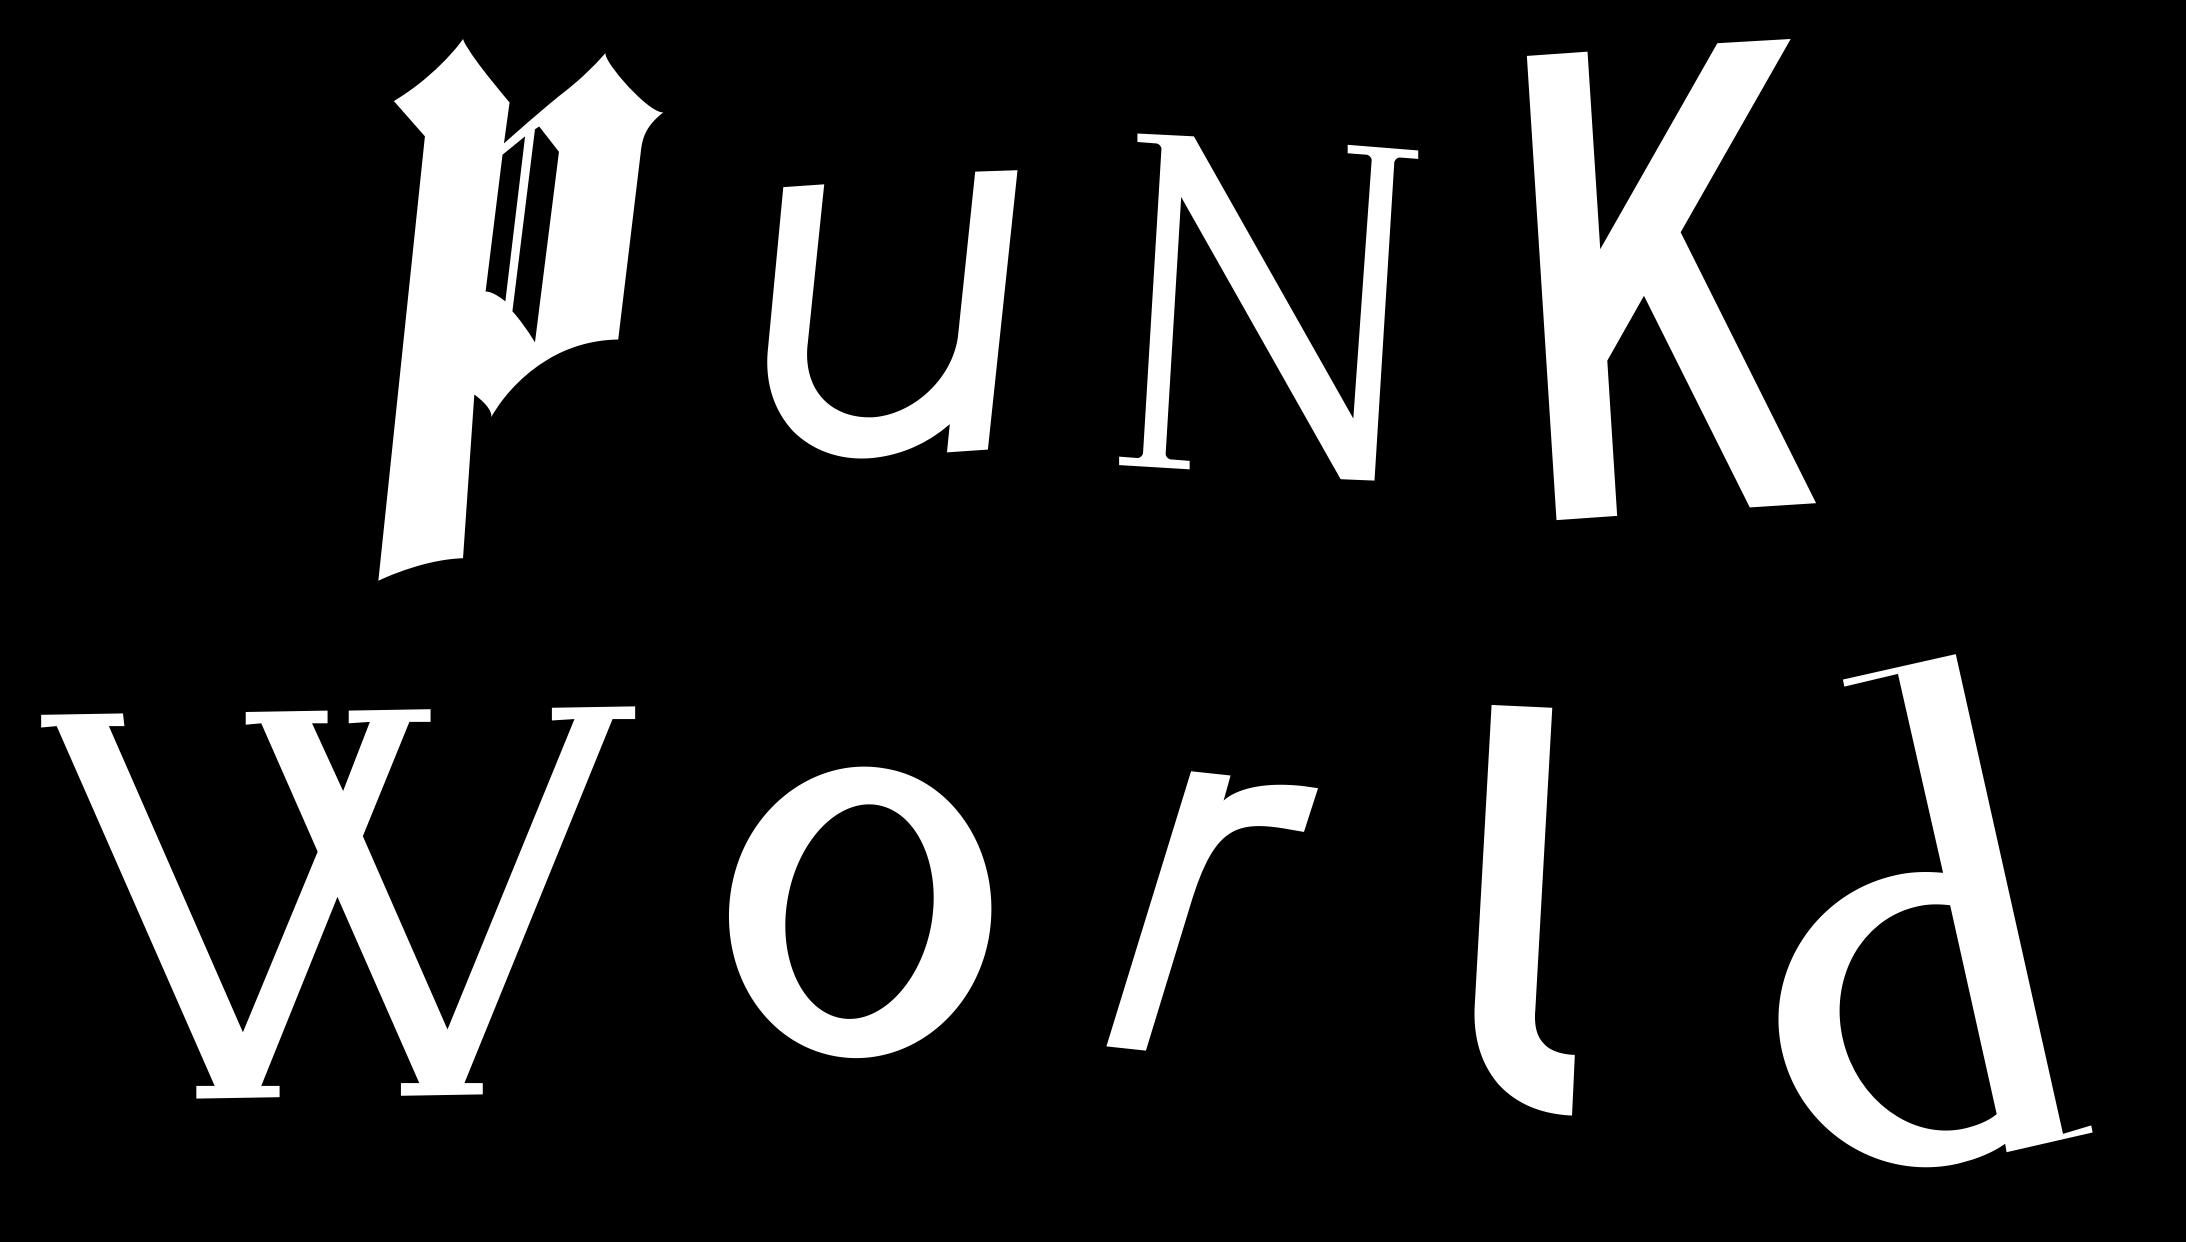 Clipart world black and white. Punk artwork big image